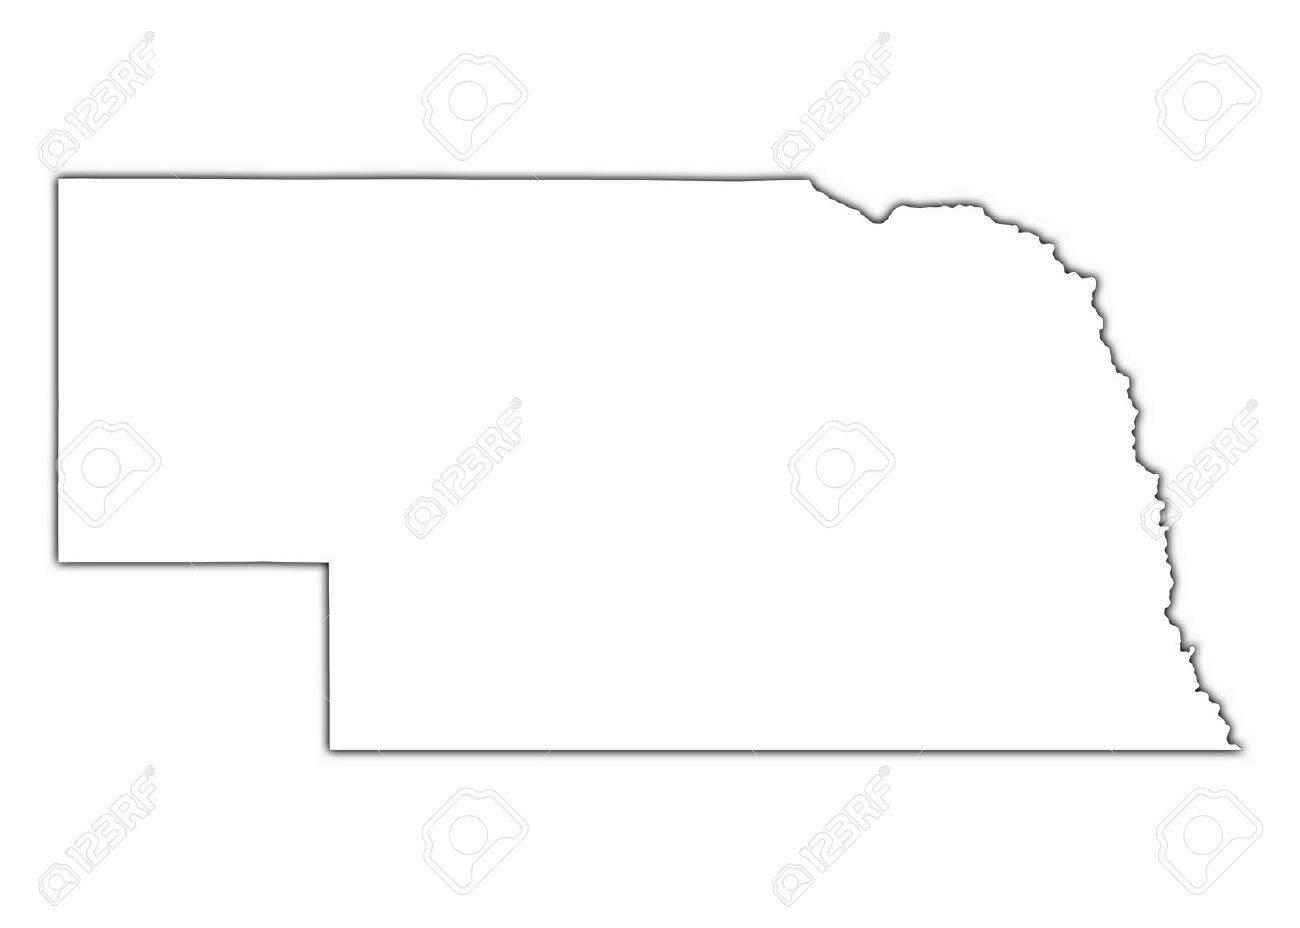 Nebraska State Maps USA Maps Of Nebraska NE Vector Color Map Of - Nebraska map usa